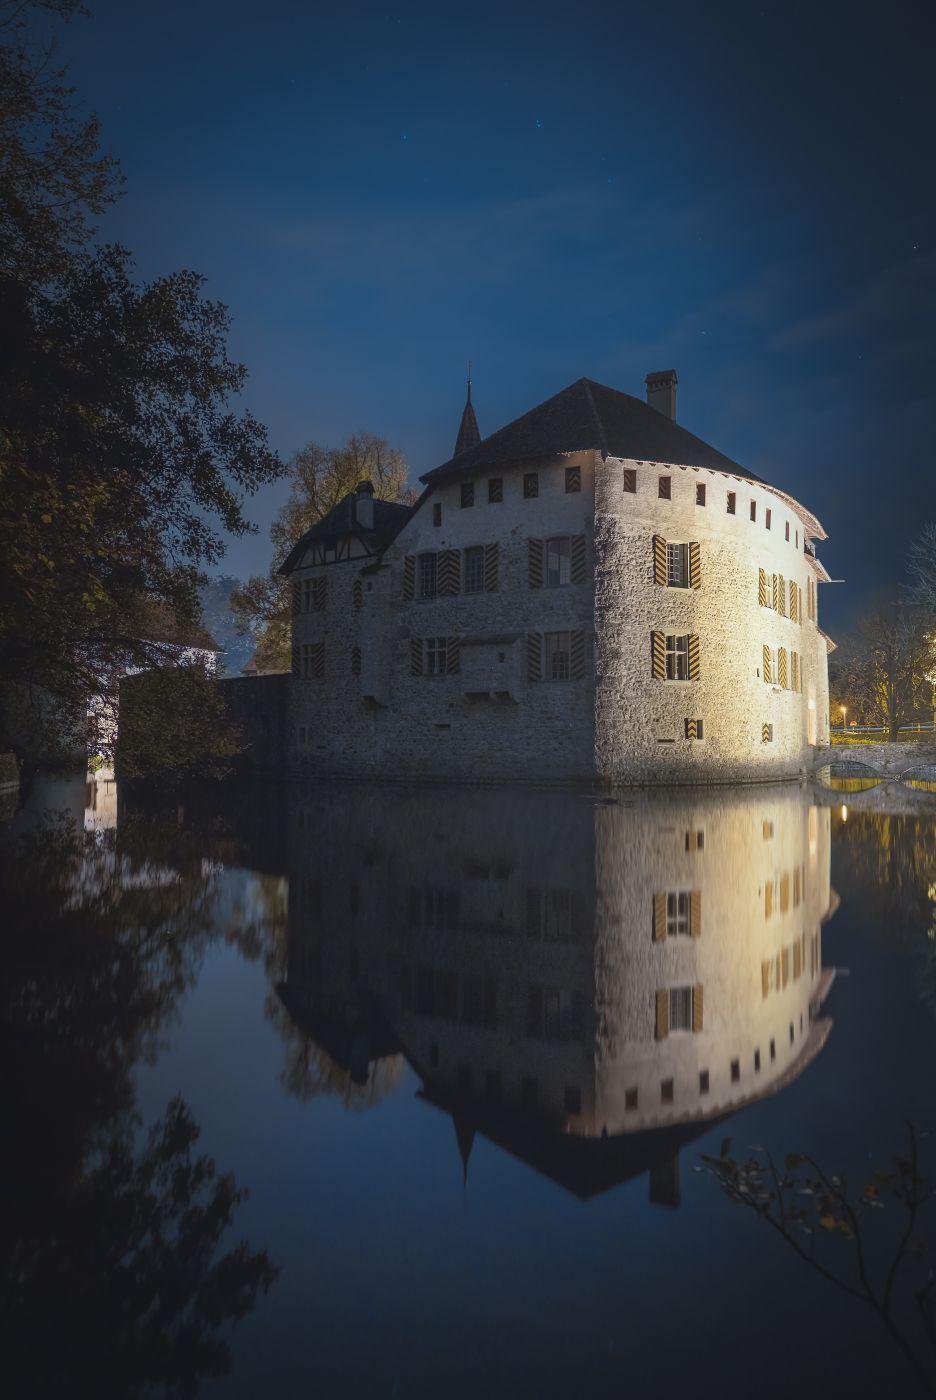 Schloss Hallwyl, Switzerland